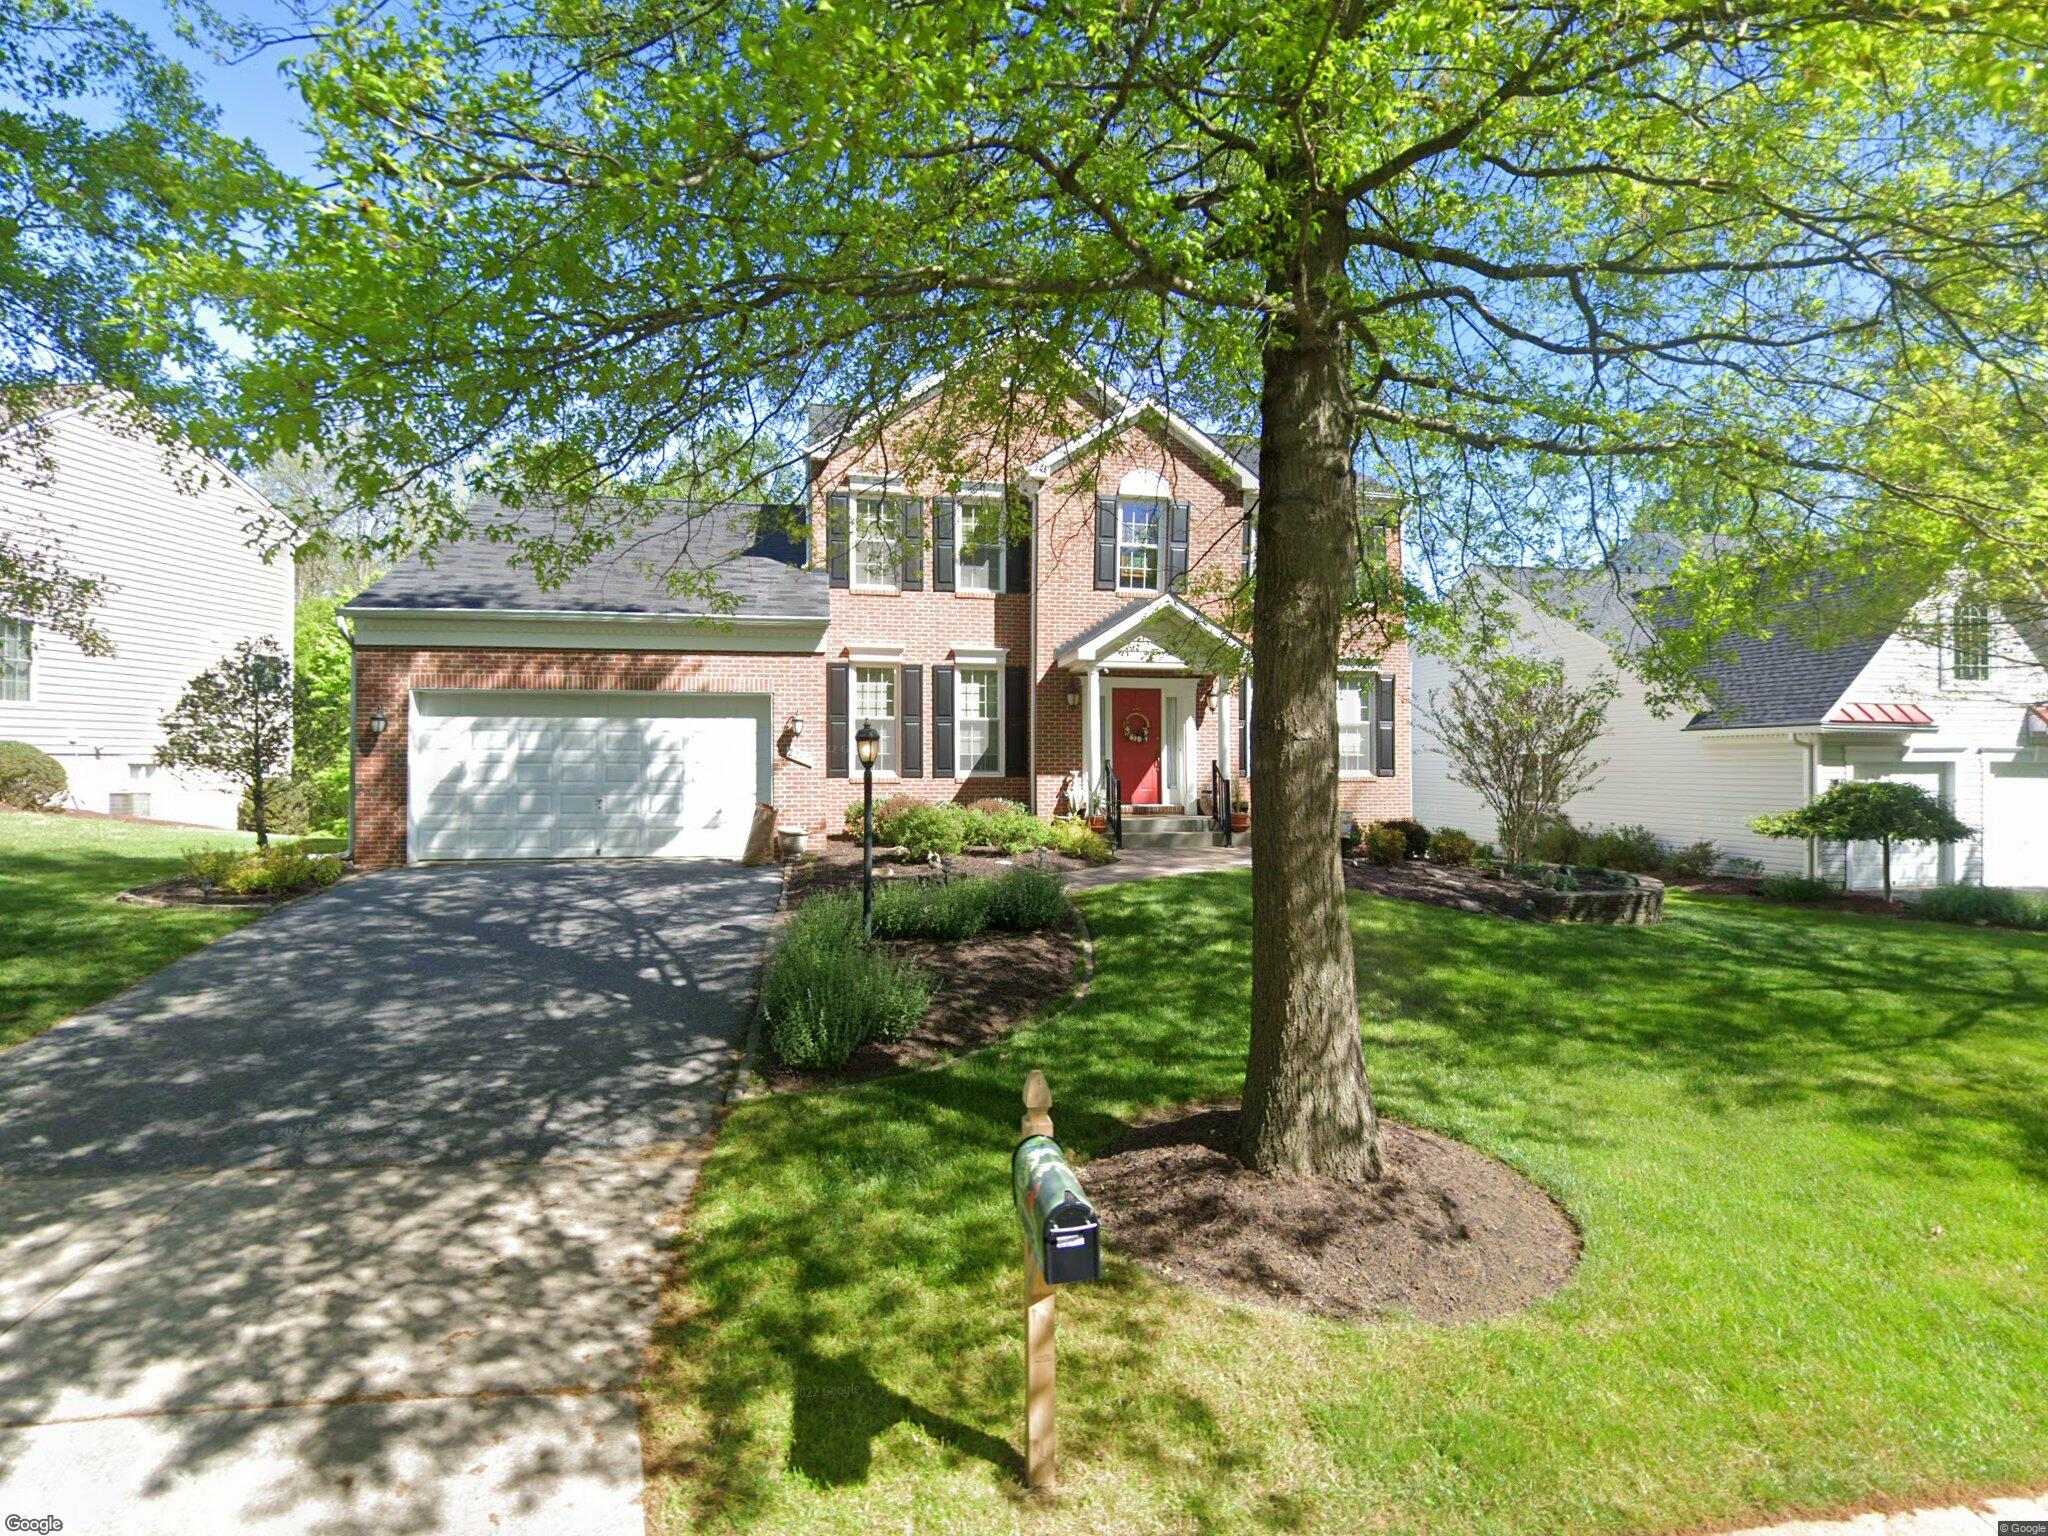 2297 ballard way, ellicott city, md 21042 | trulia